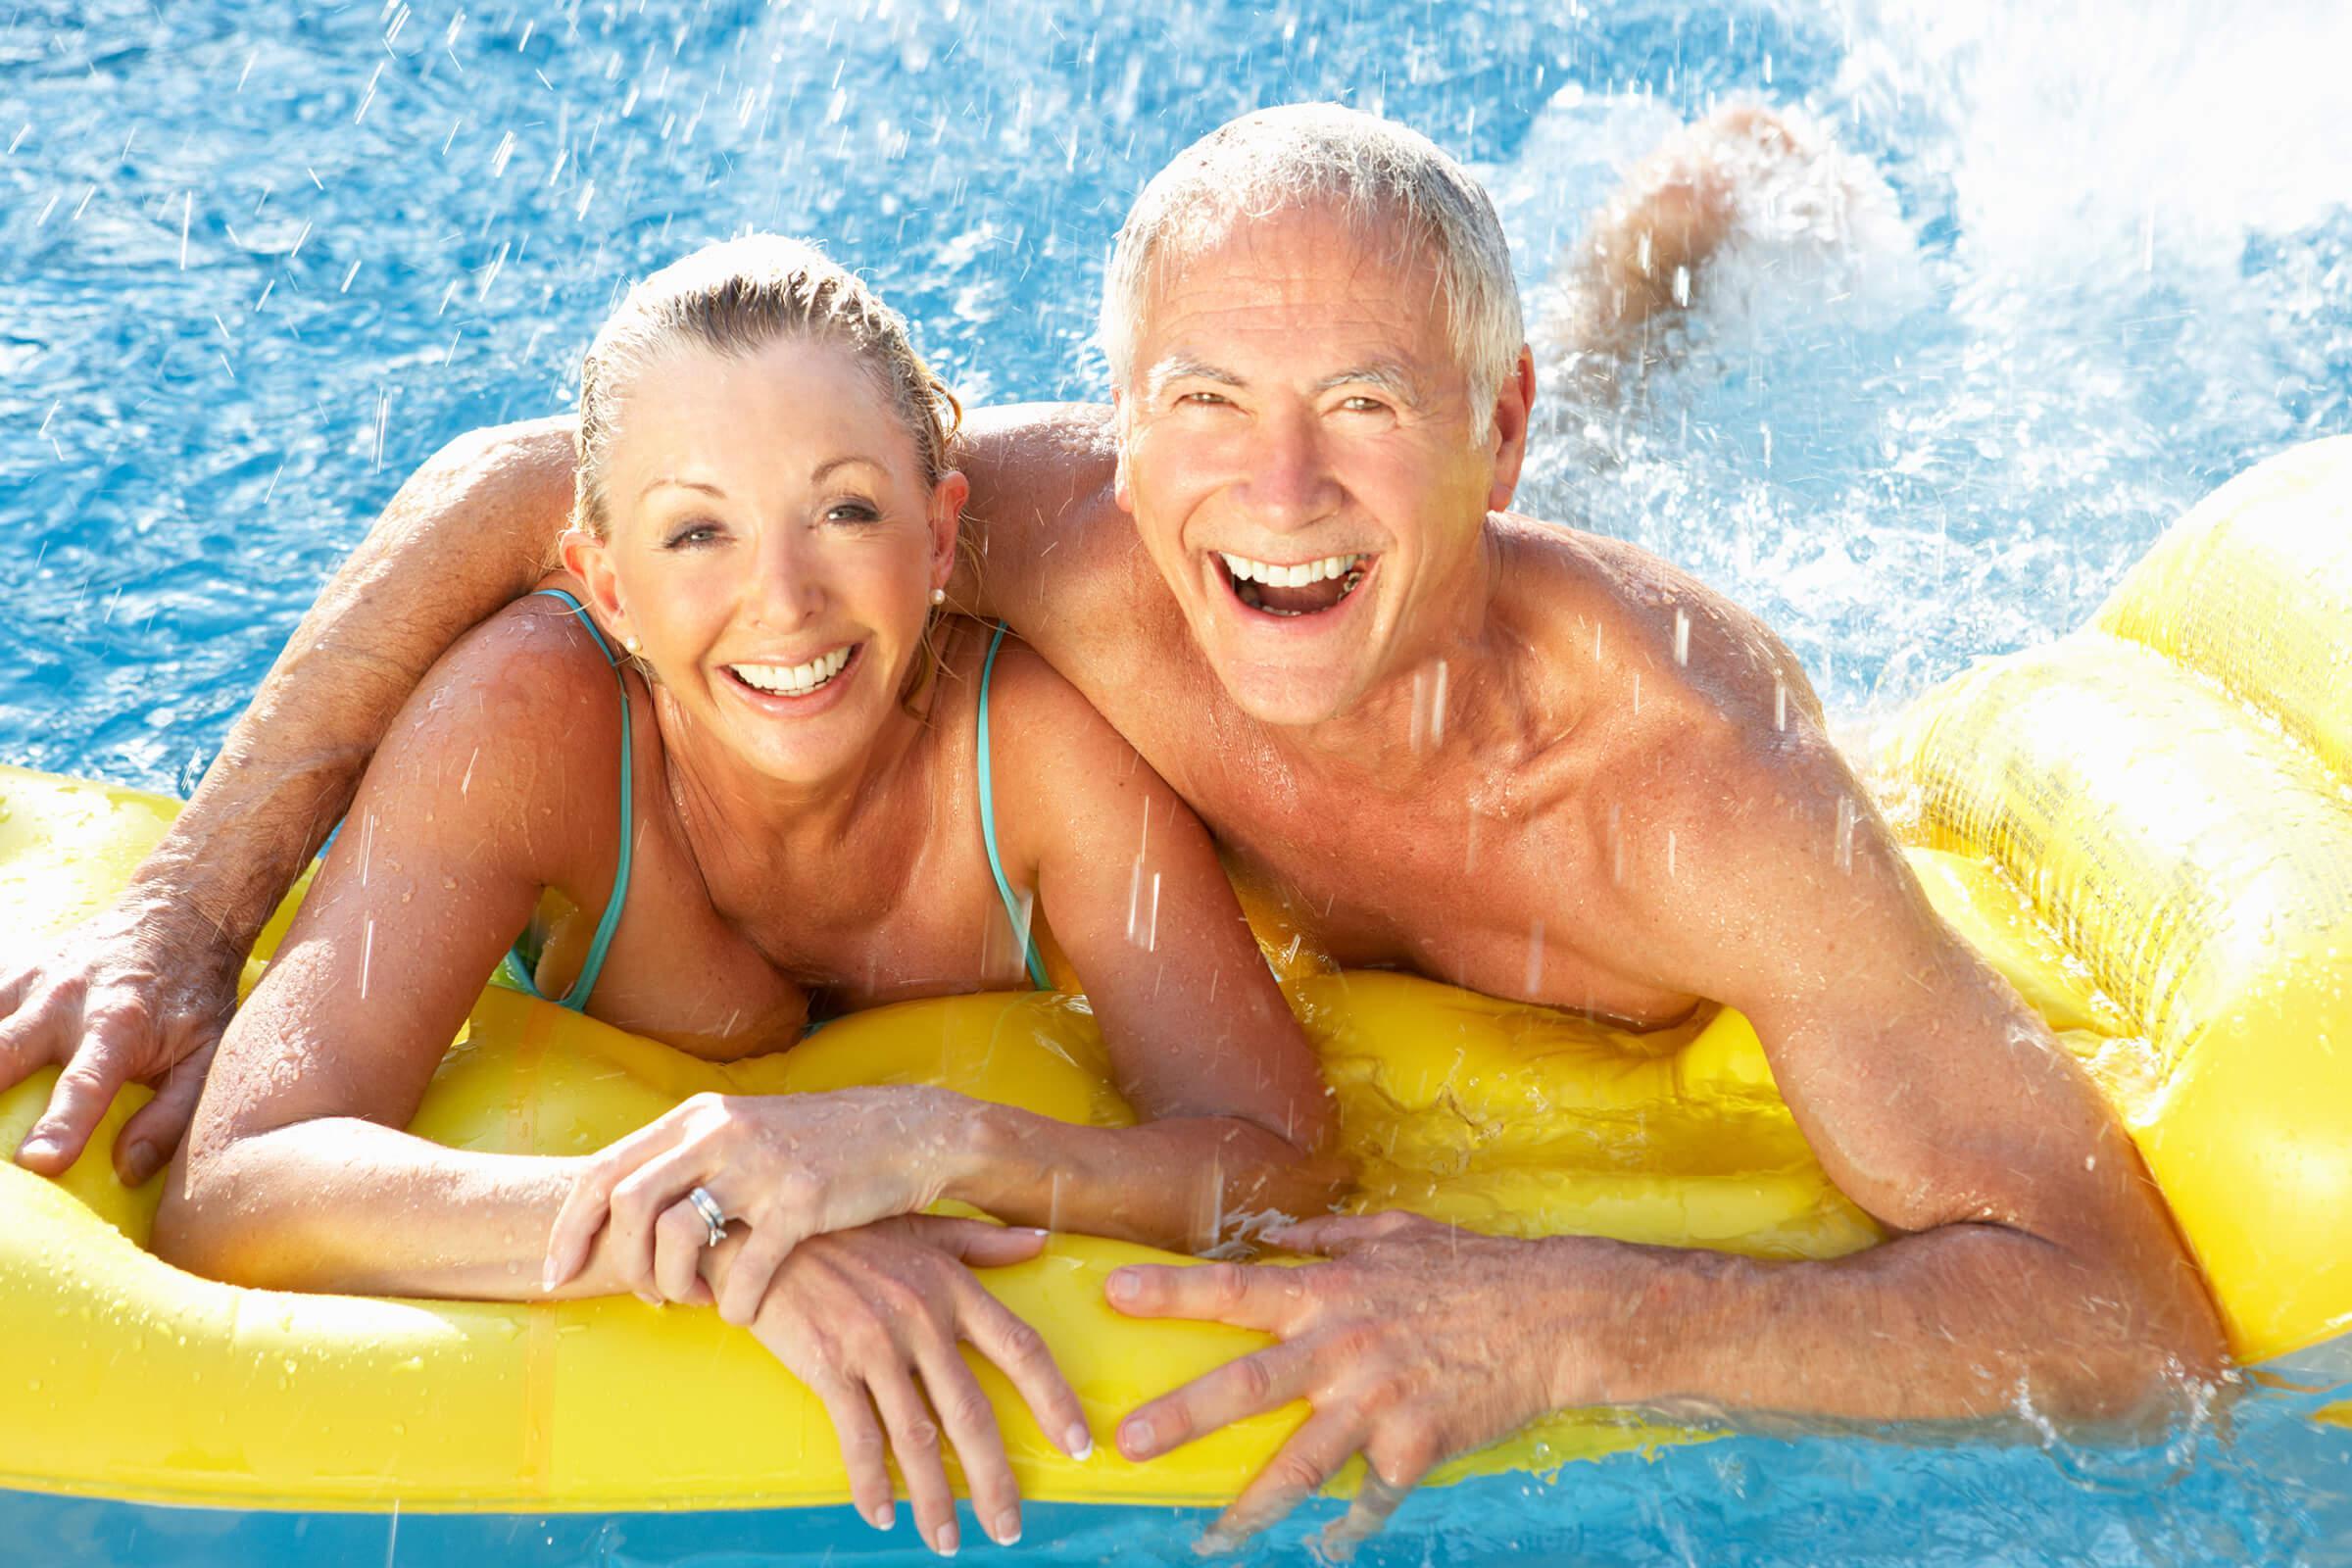 Senior couple having fun in pool iStock-121028974.jpg